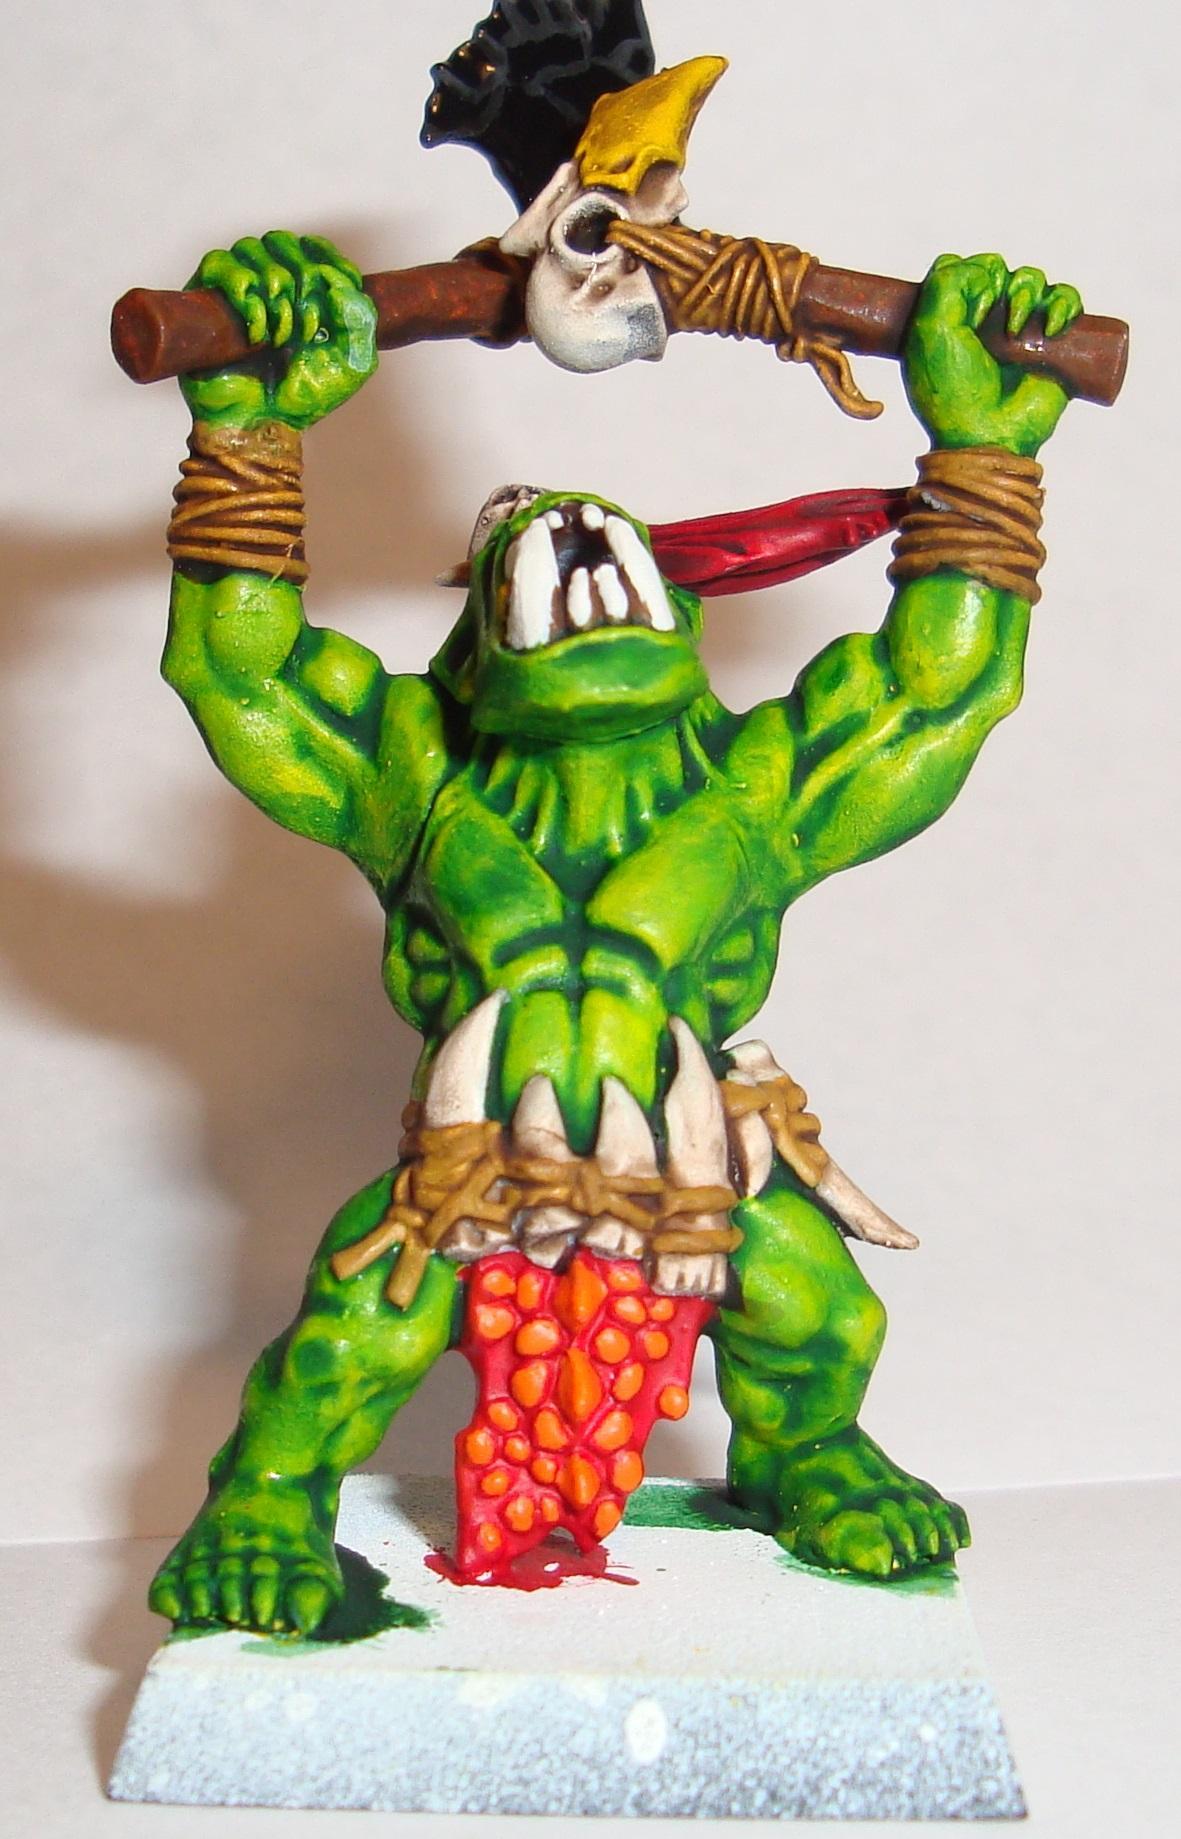 Goblins, Night Goblins, Orcs, Savage Orcs, Warhammer Fantasy